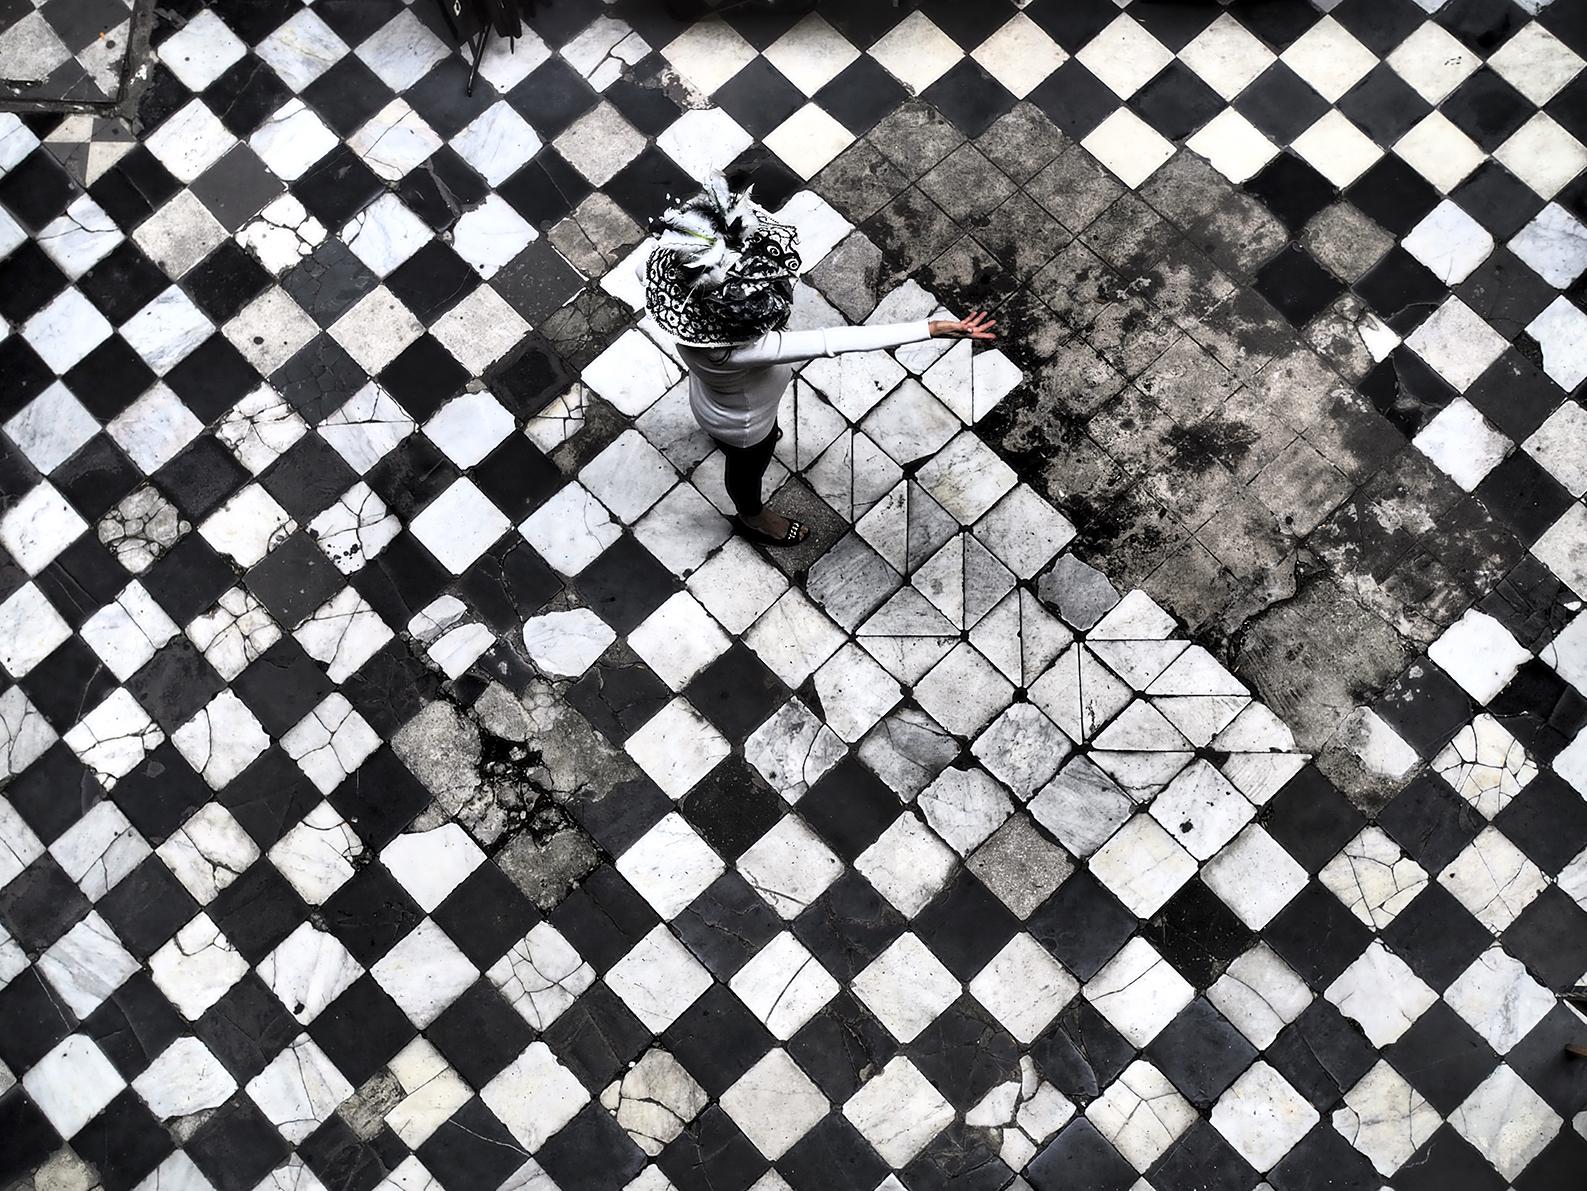 linda cartridge photographer and artist - Argentina